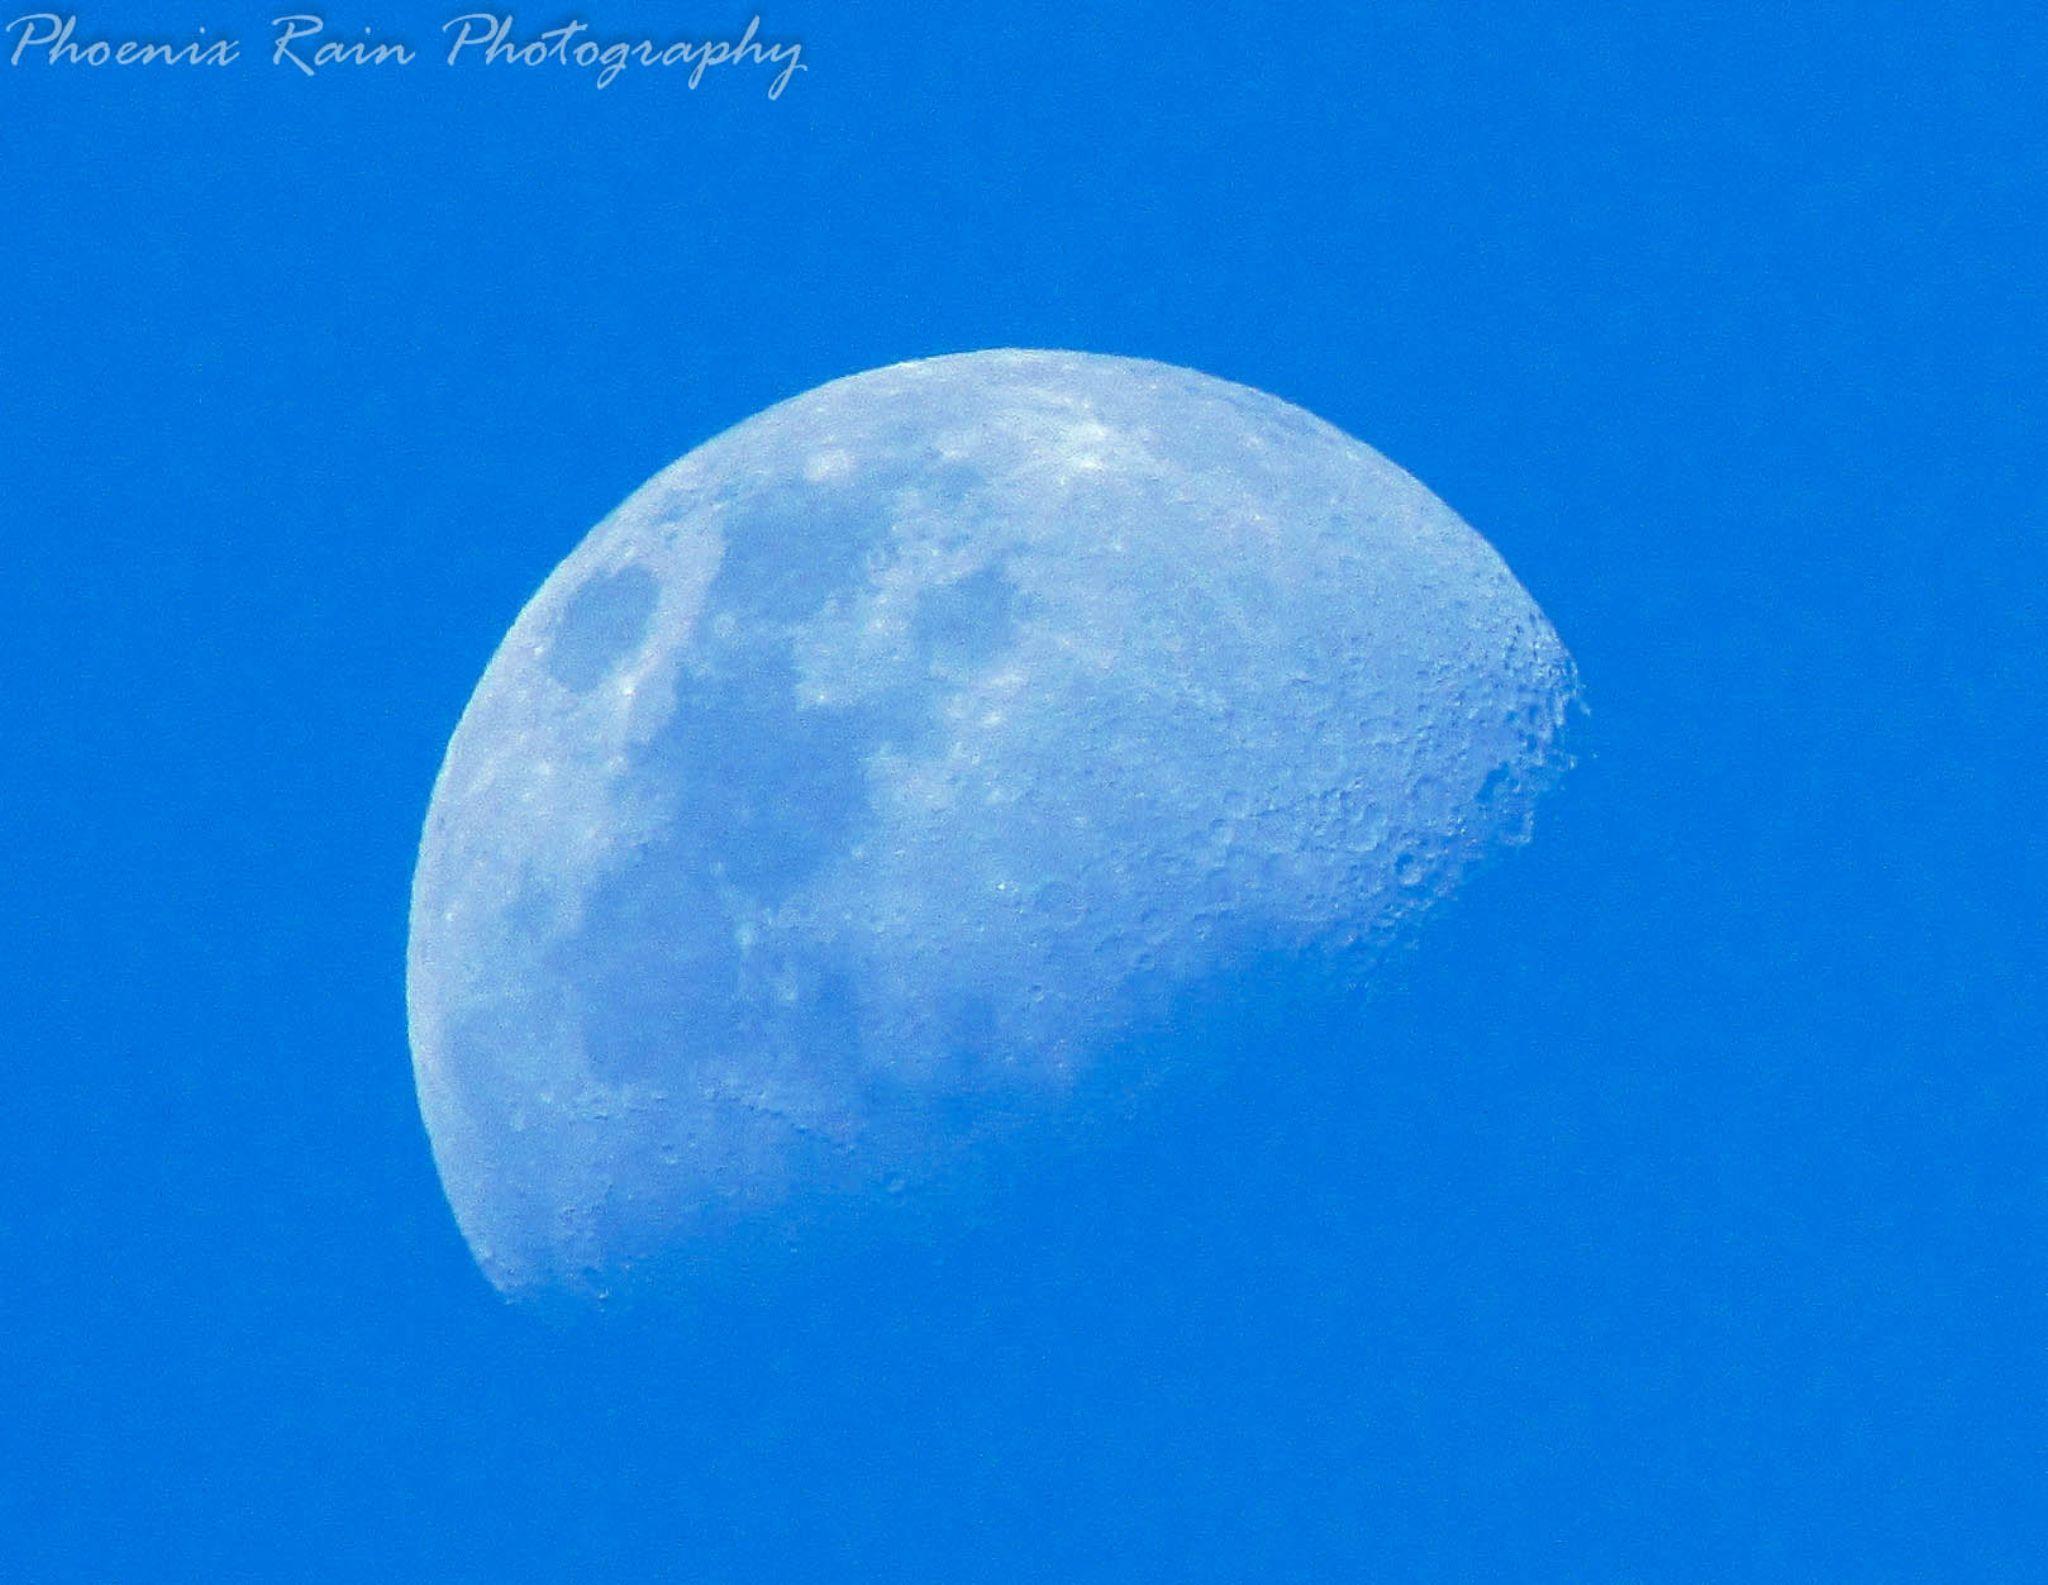 Day Moon, New Zealand by Phoenix Rain